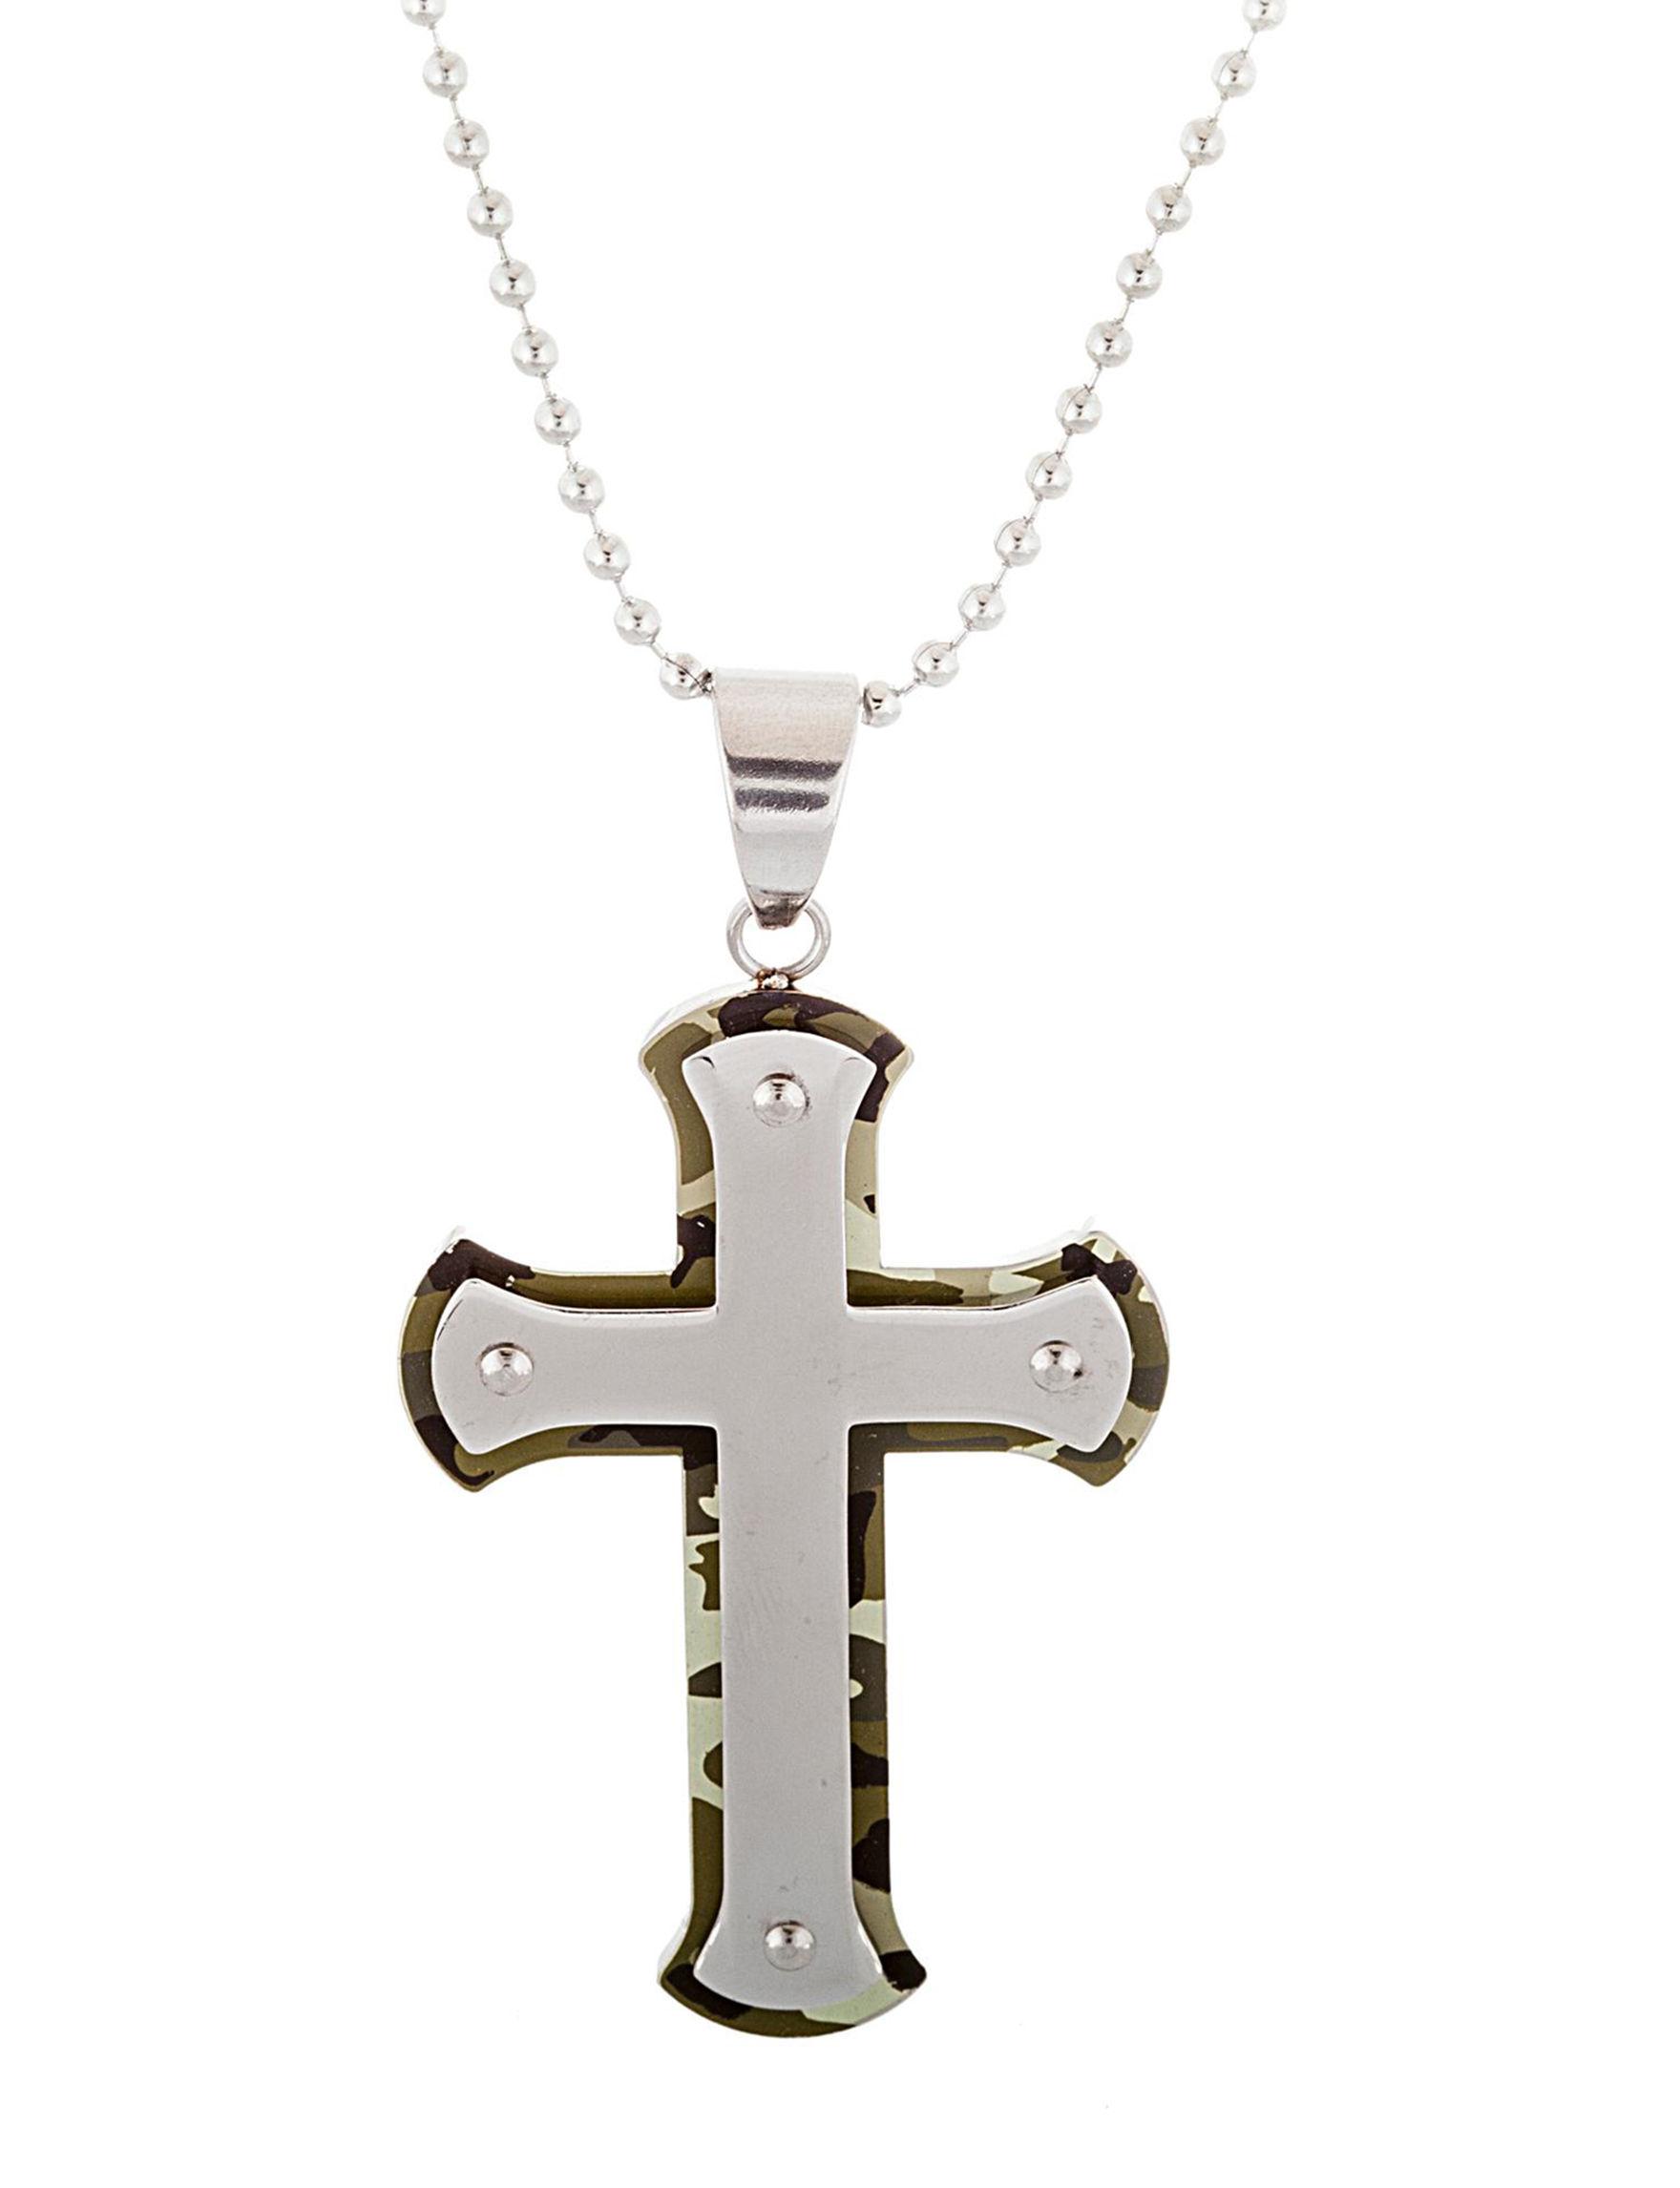 NES Steel/ Green Necklaces & Pendants Fine Jewelry